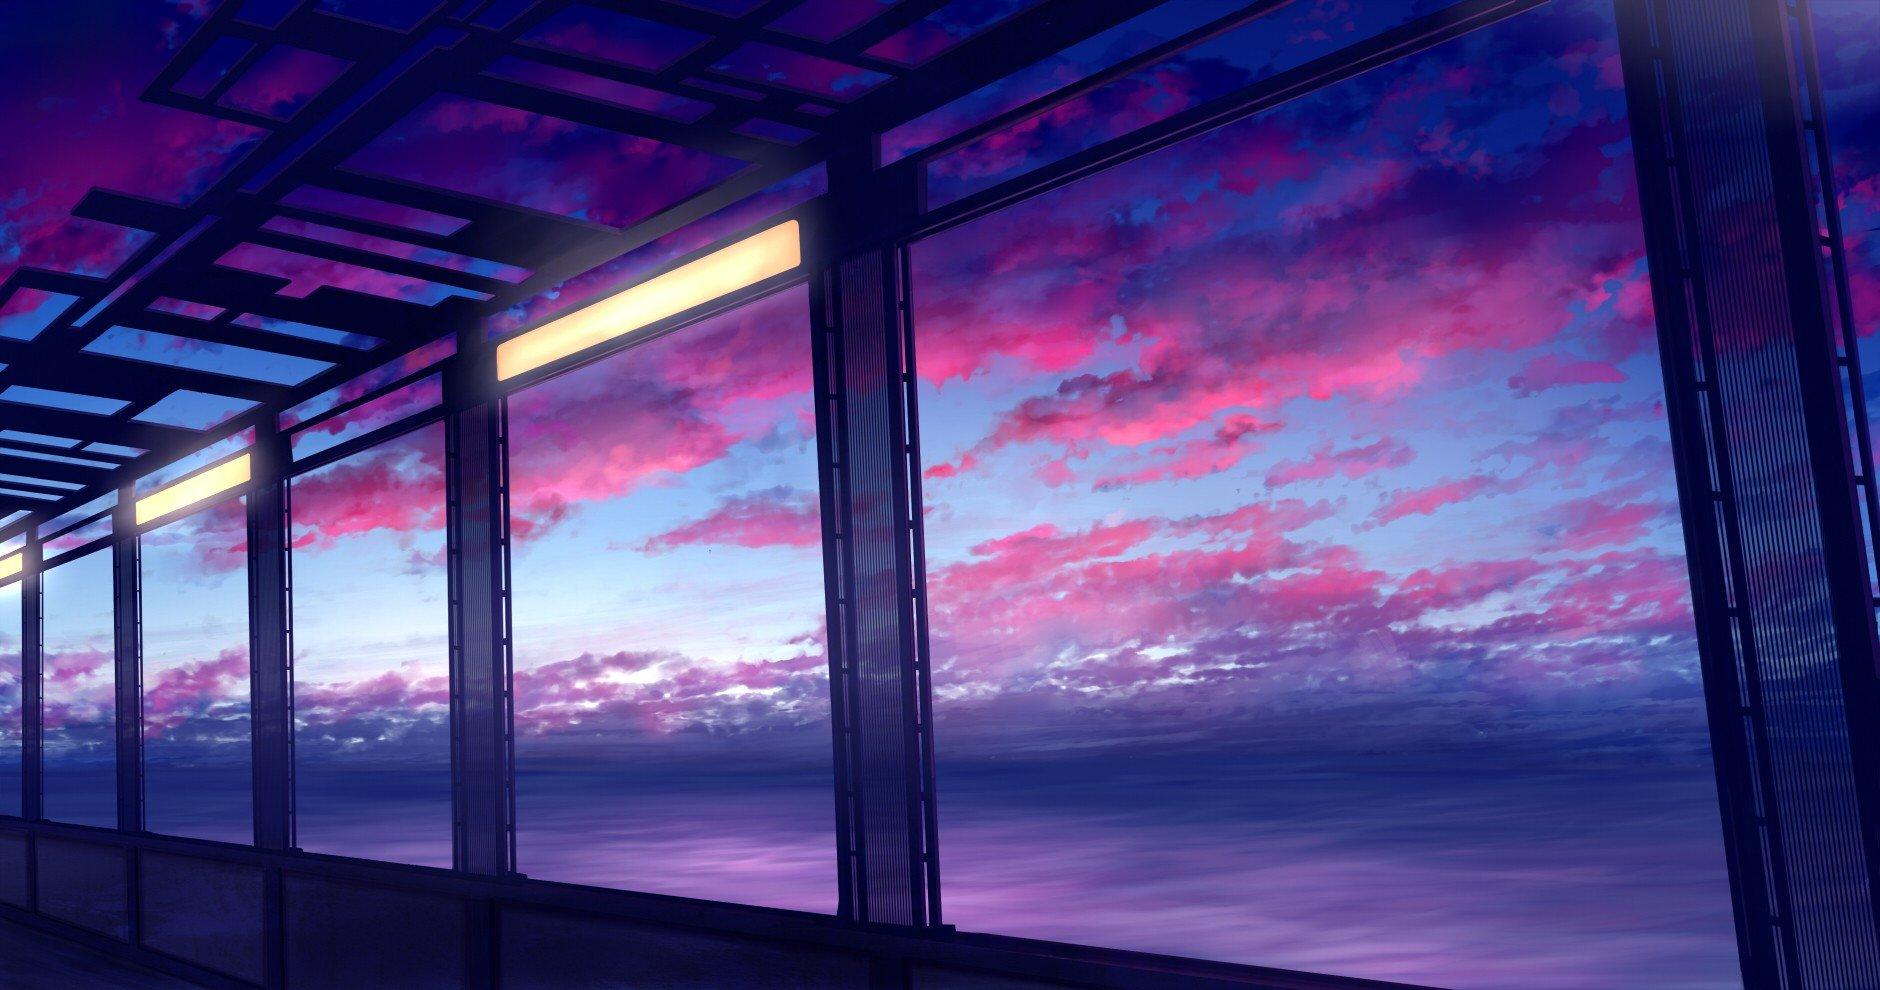 Light Blue Aesthetic Pastel Room